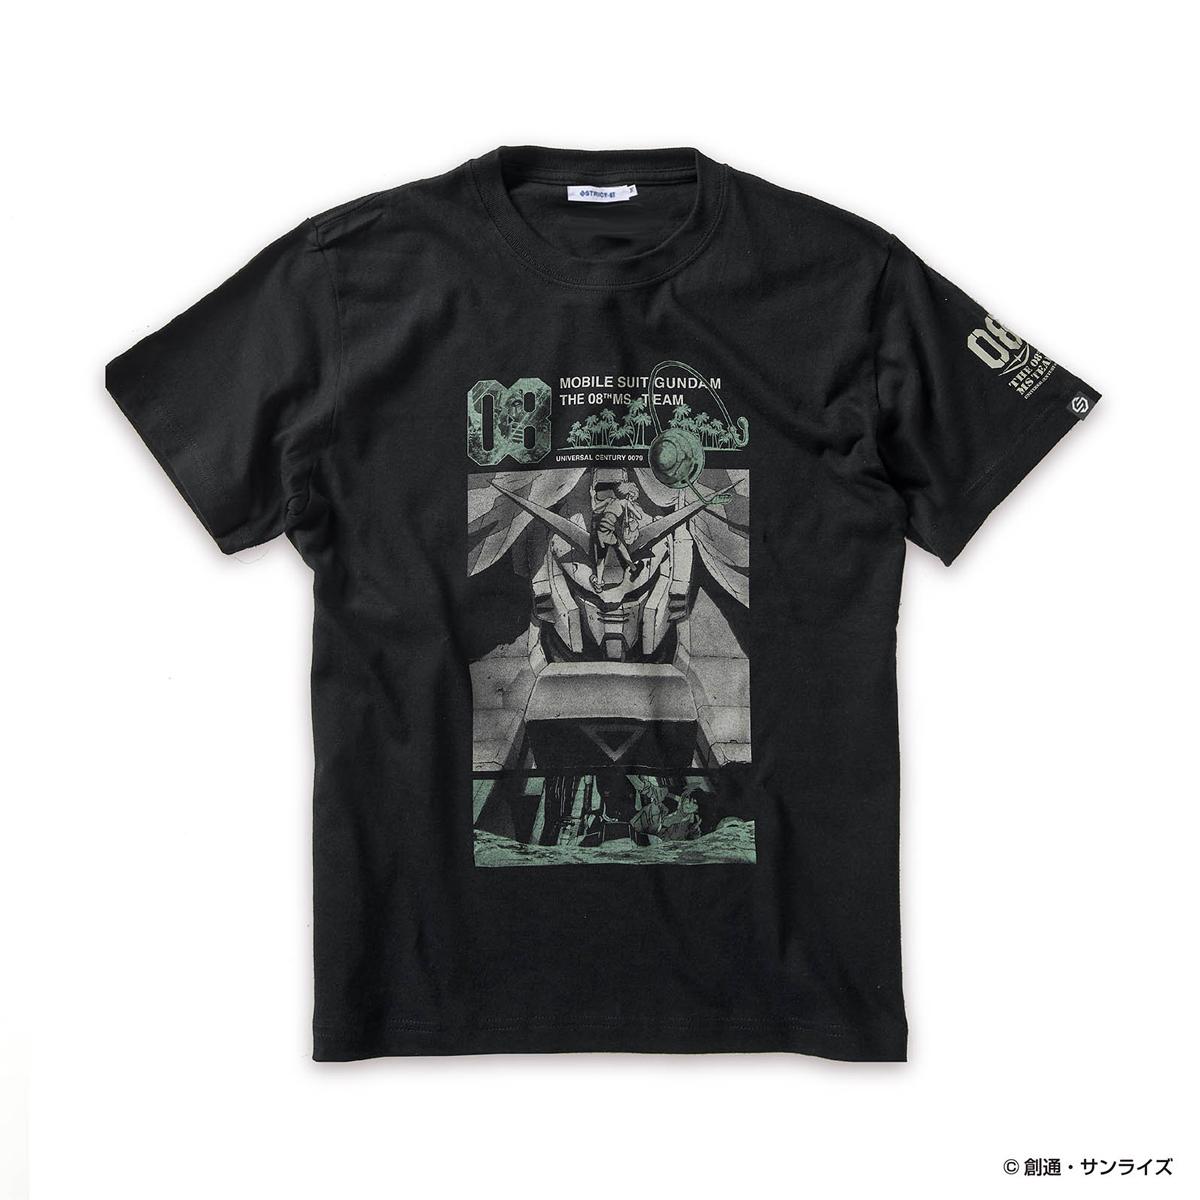 STRICT-G『機動戦士ガンダム 第08MS小隊』 Tシャツ RX-79柄